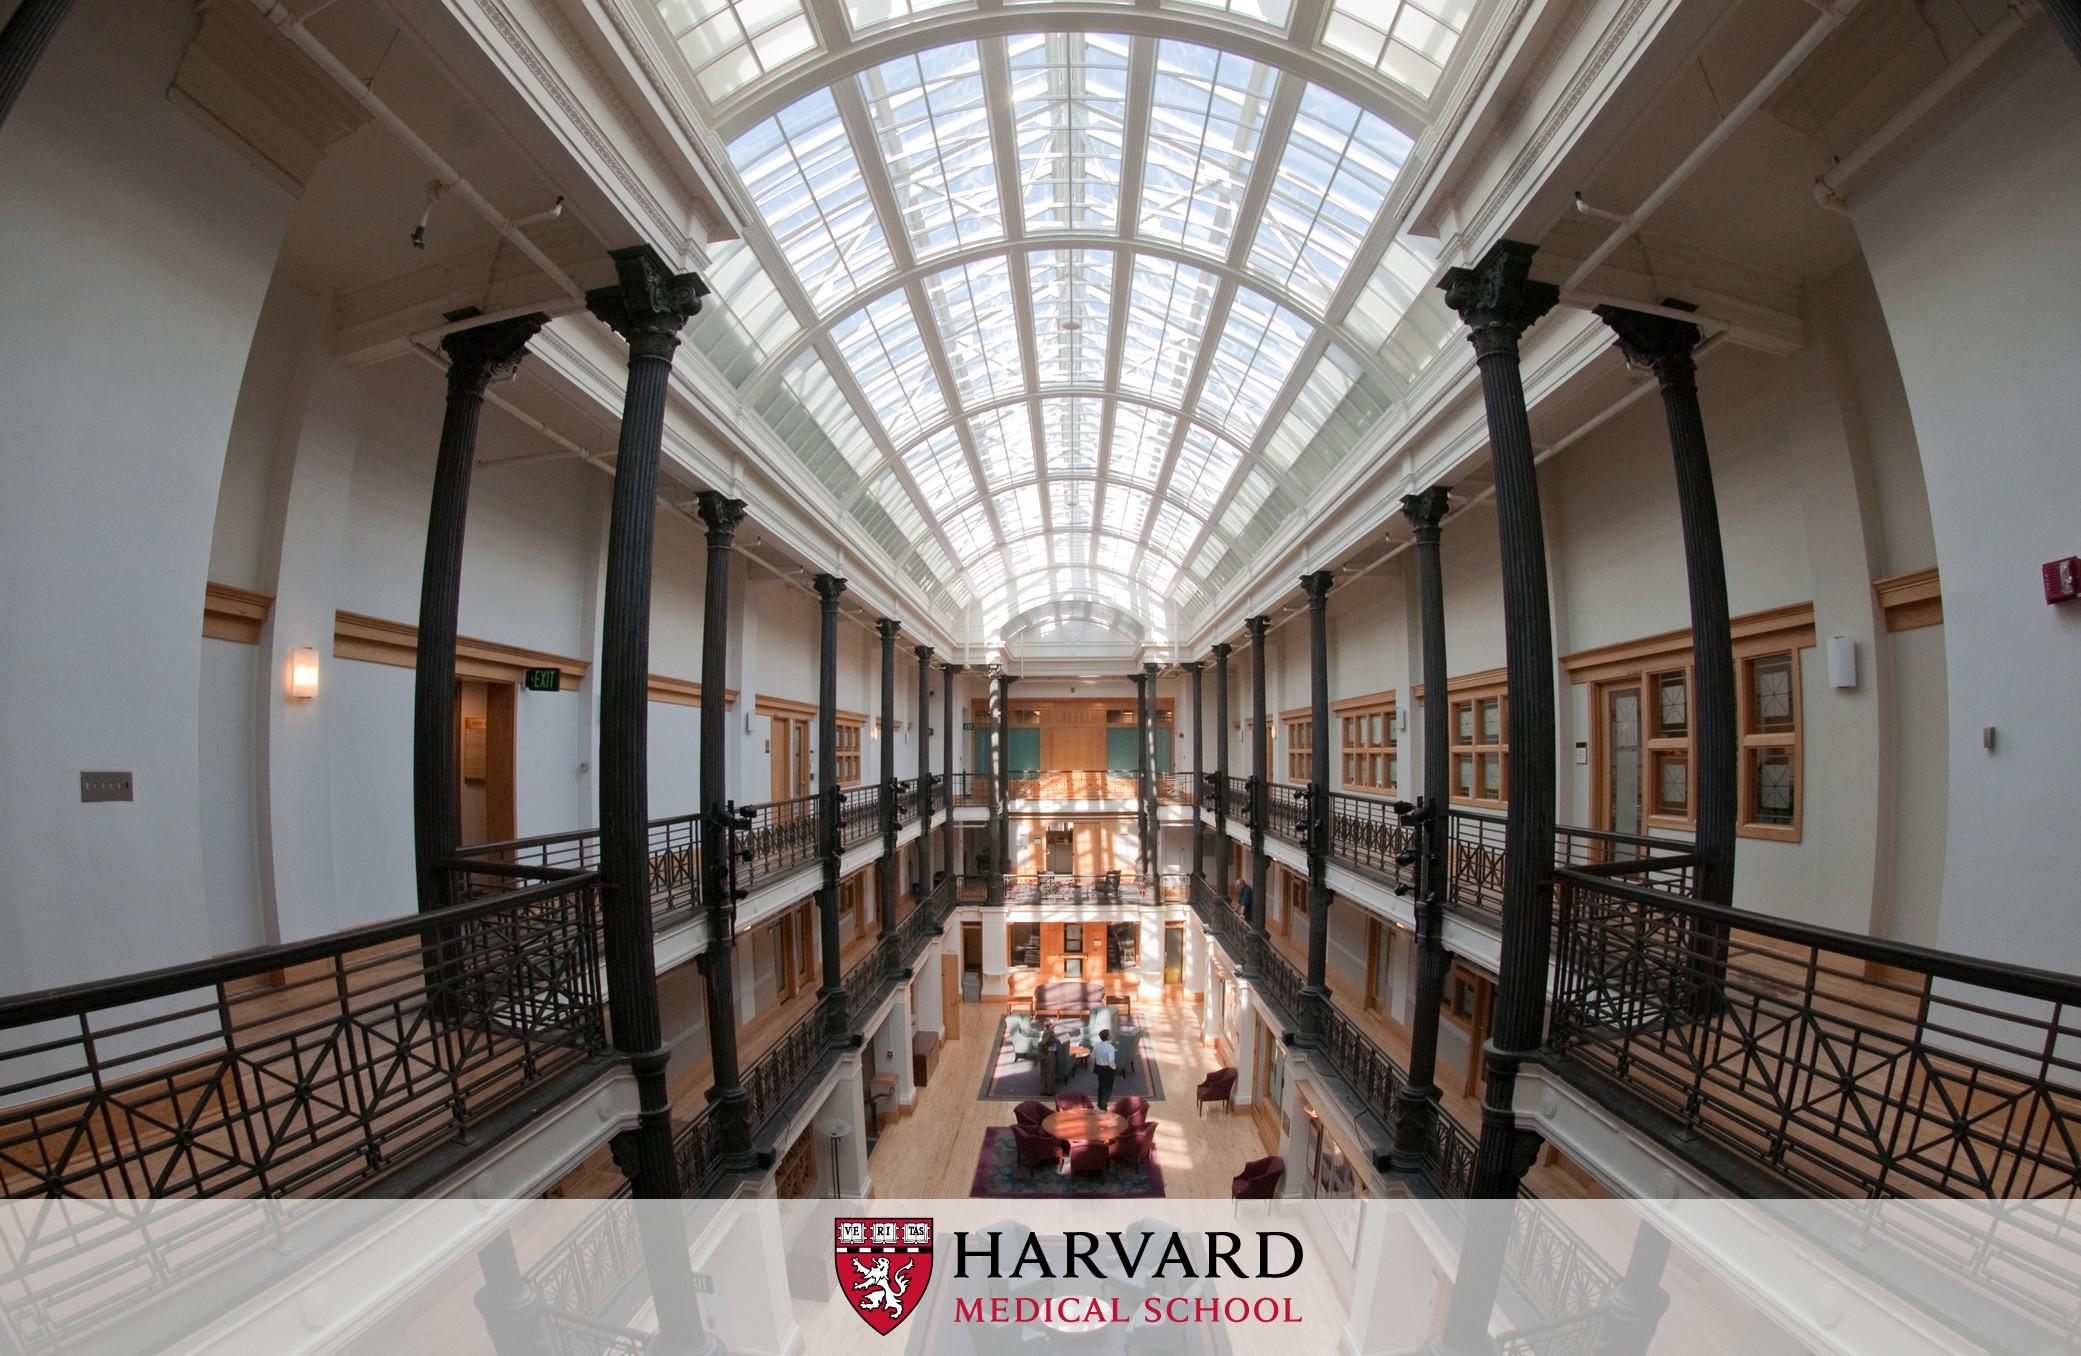 Harvard University Wallpapers (62+ images)